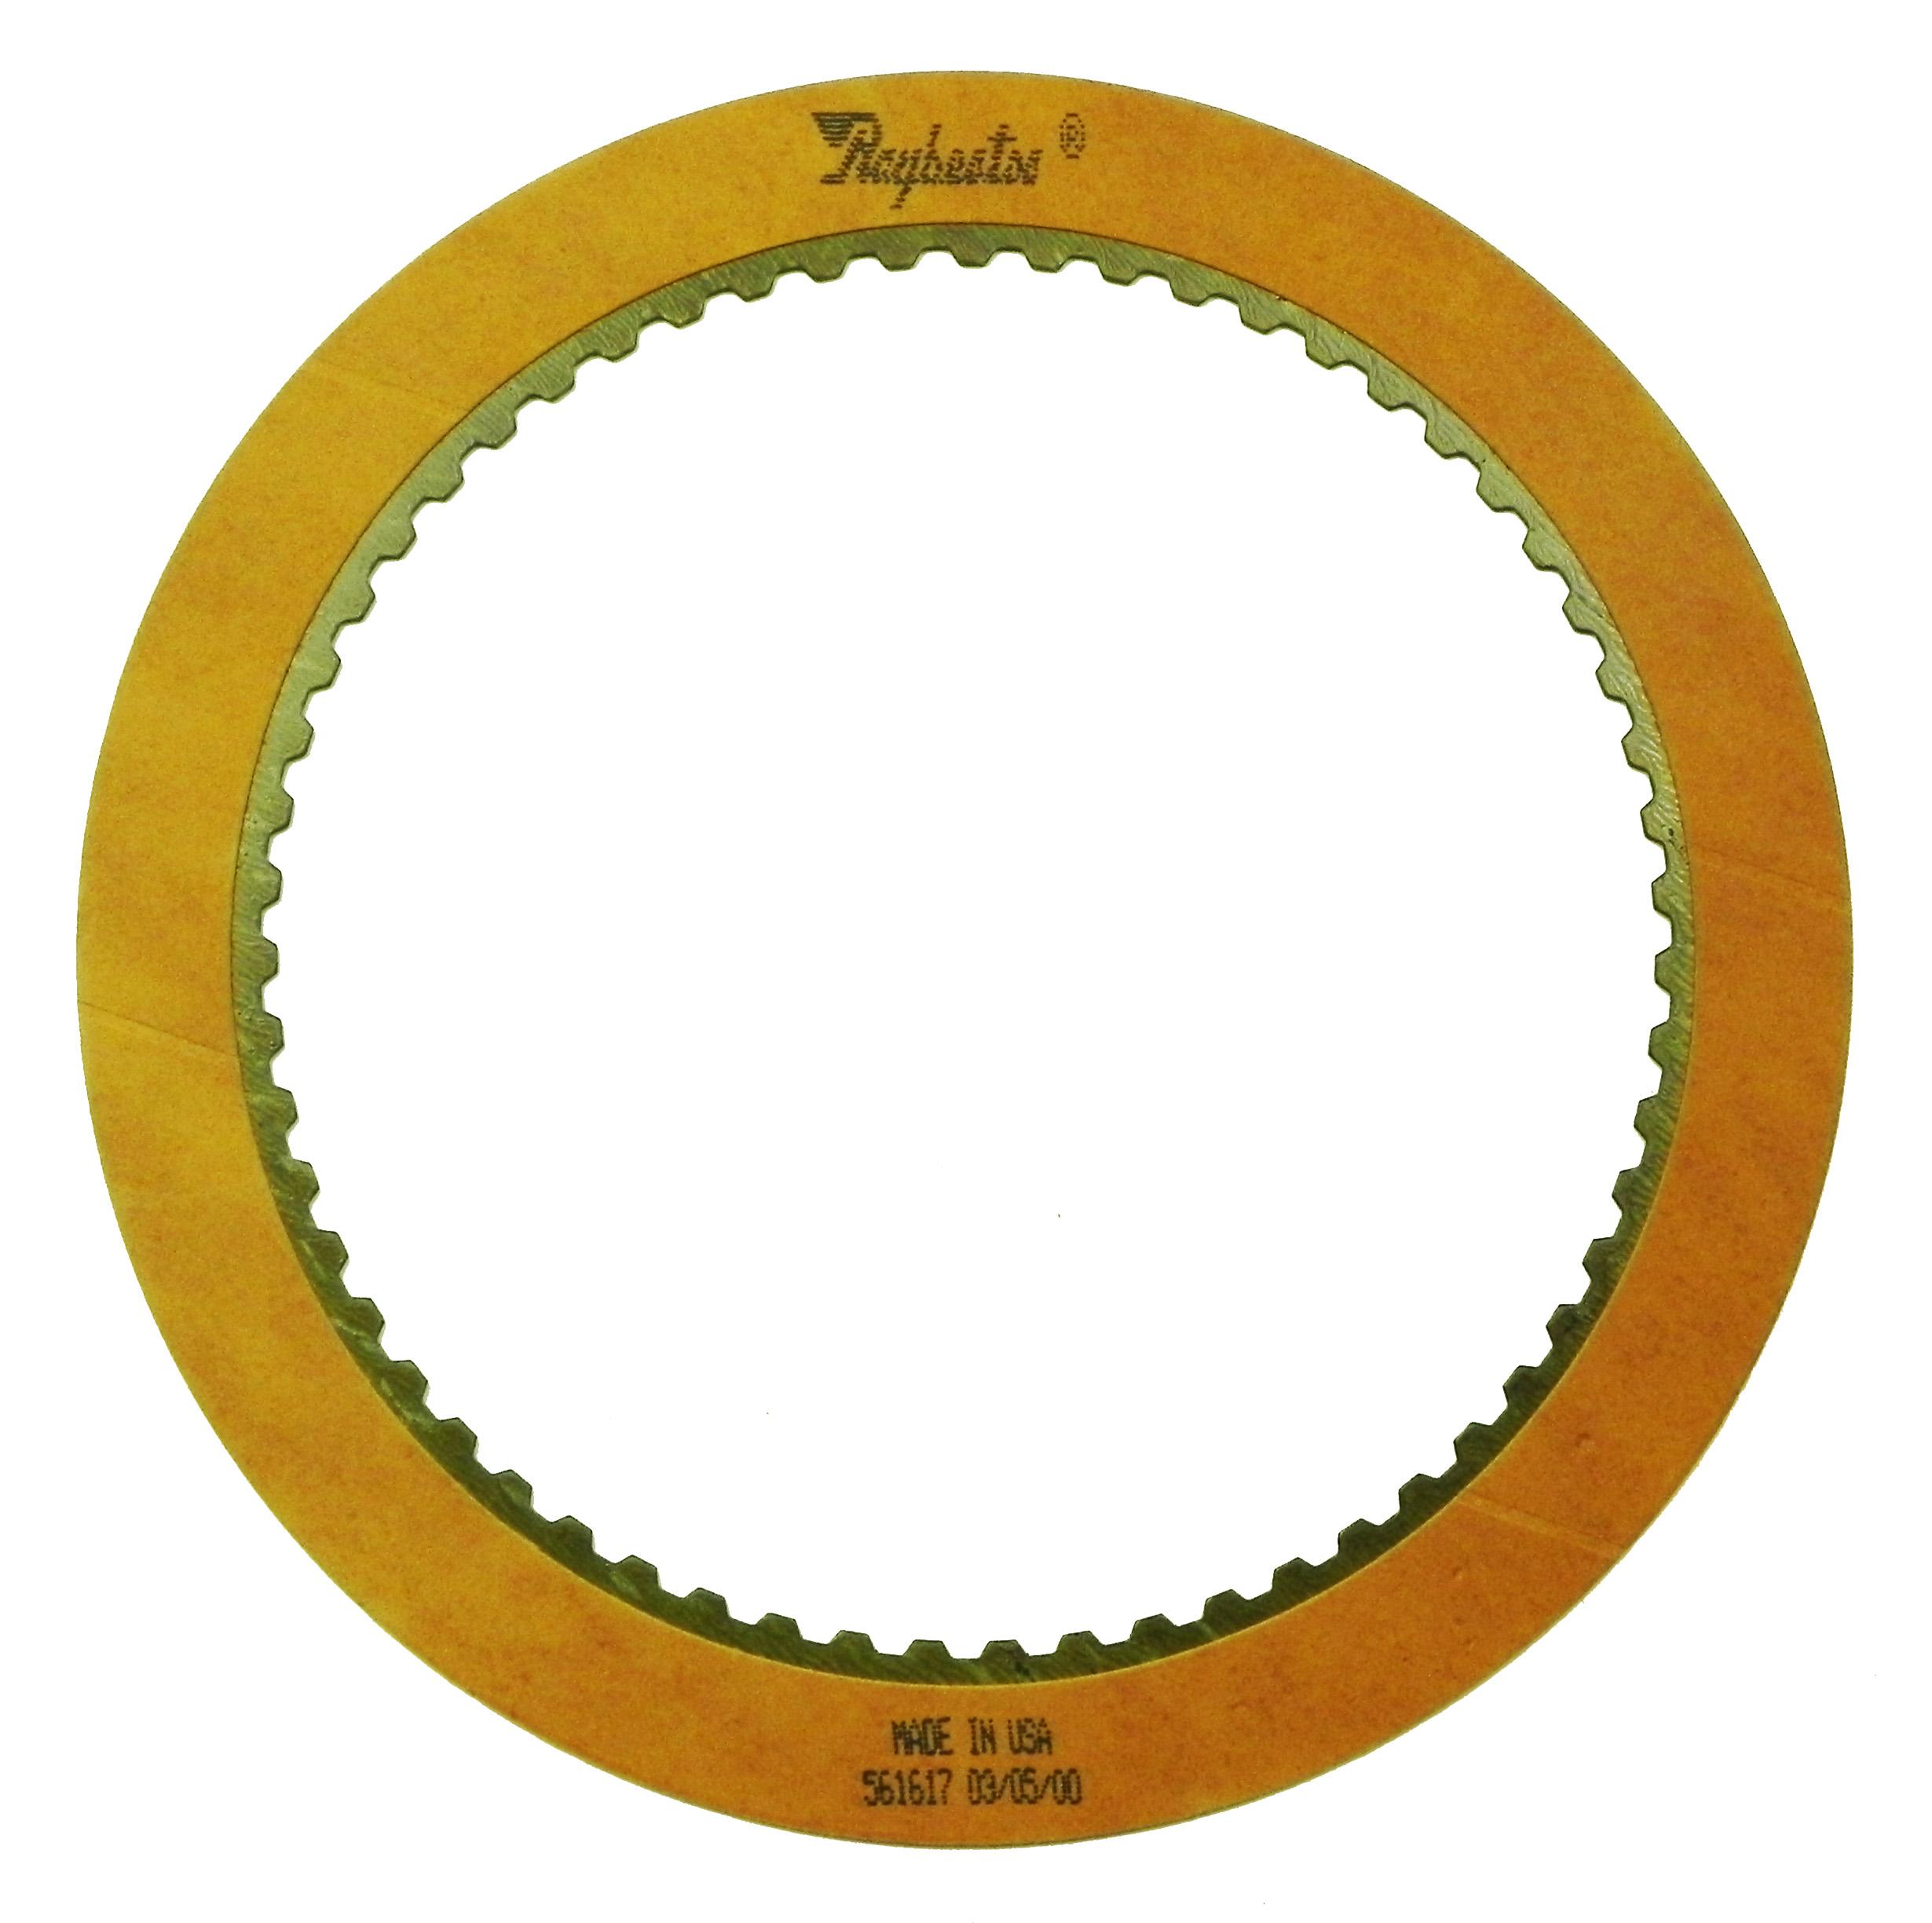 AX4N High Energy Friction Clutch Plate